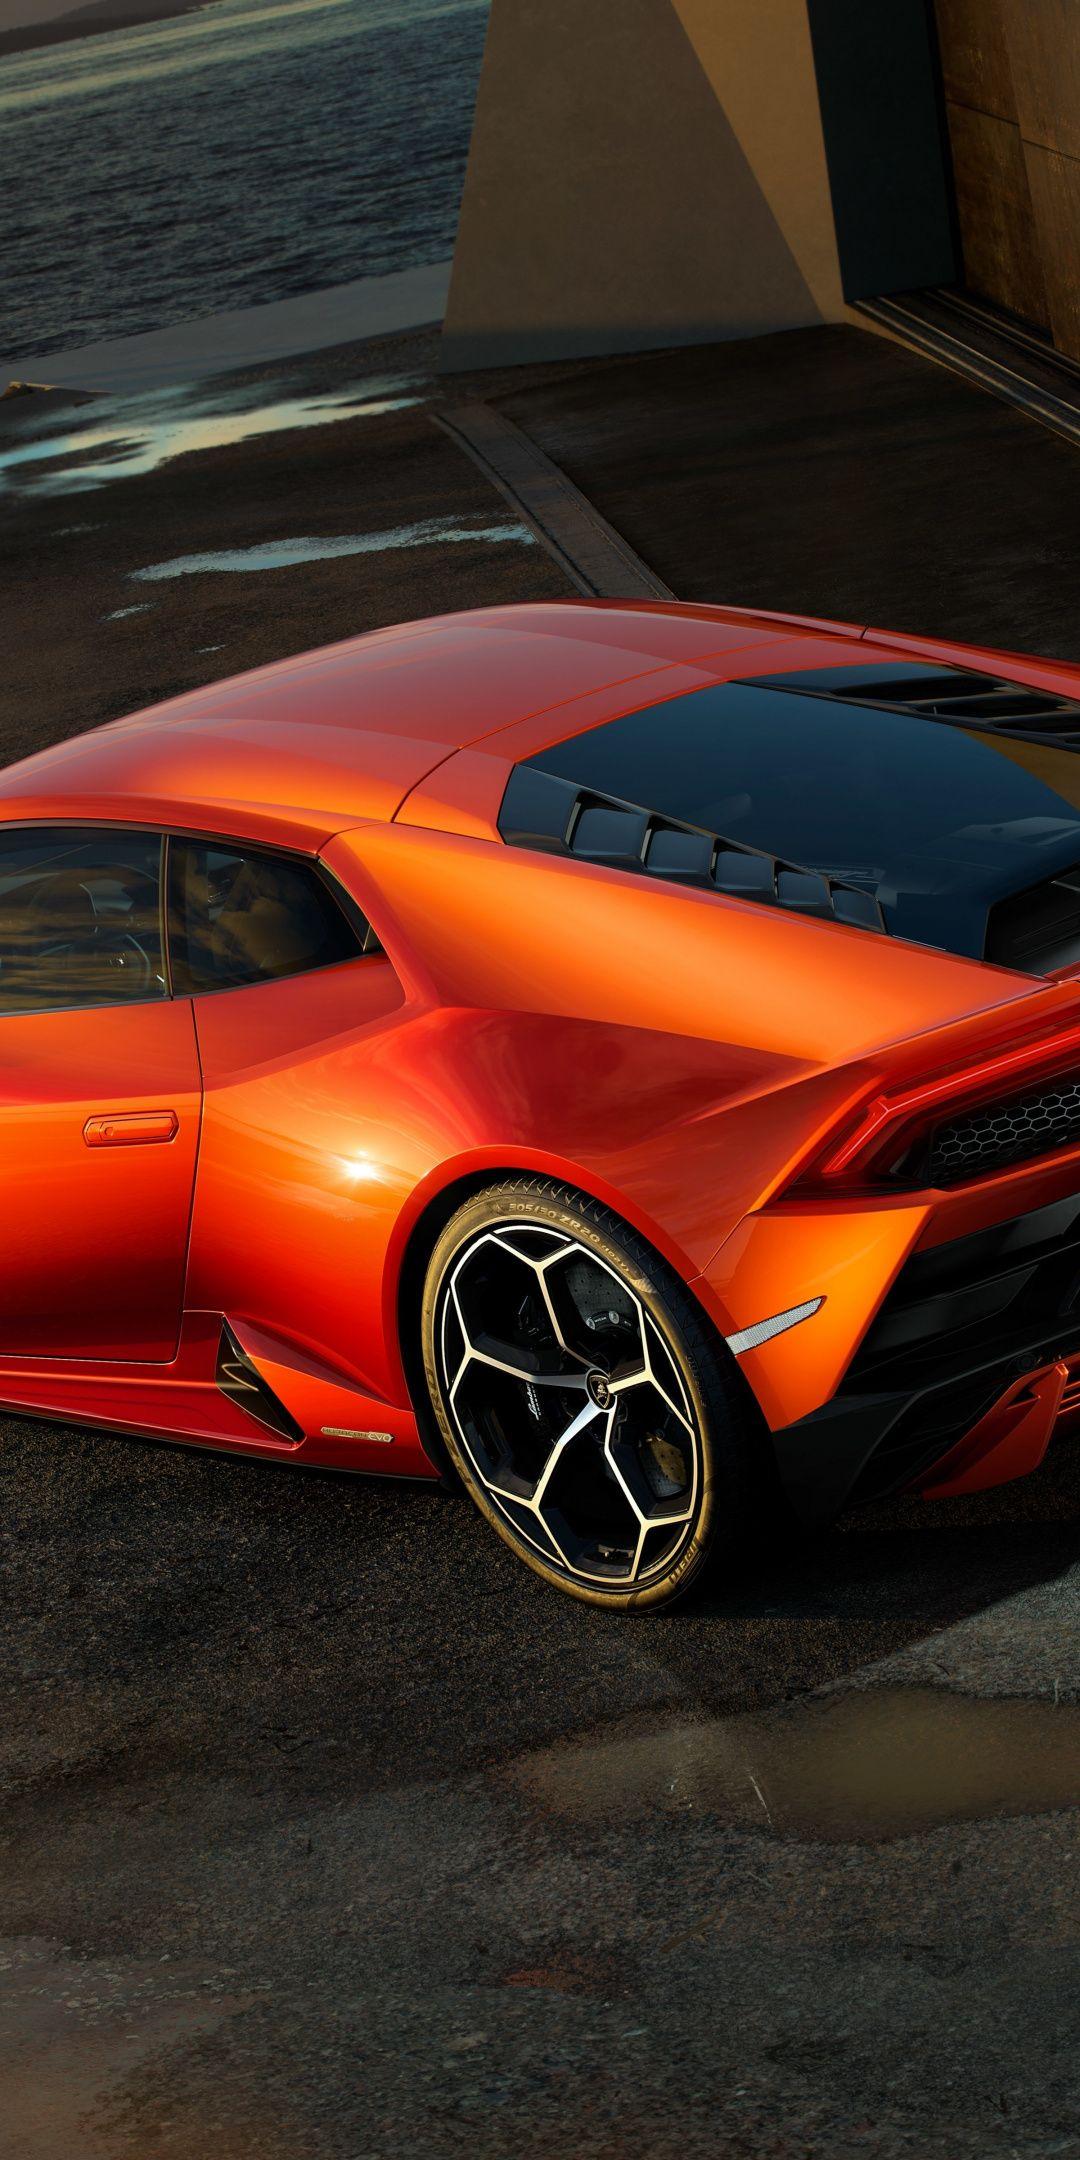 Rear View Lamborghini Huracan Orange Sports Car 1080x2160 Wallpaper Sports Car Lamborghini Lamborghini Huracan